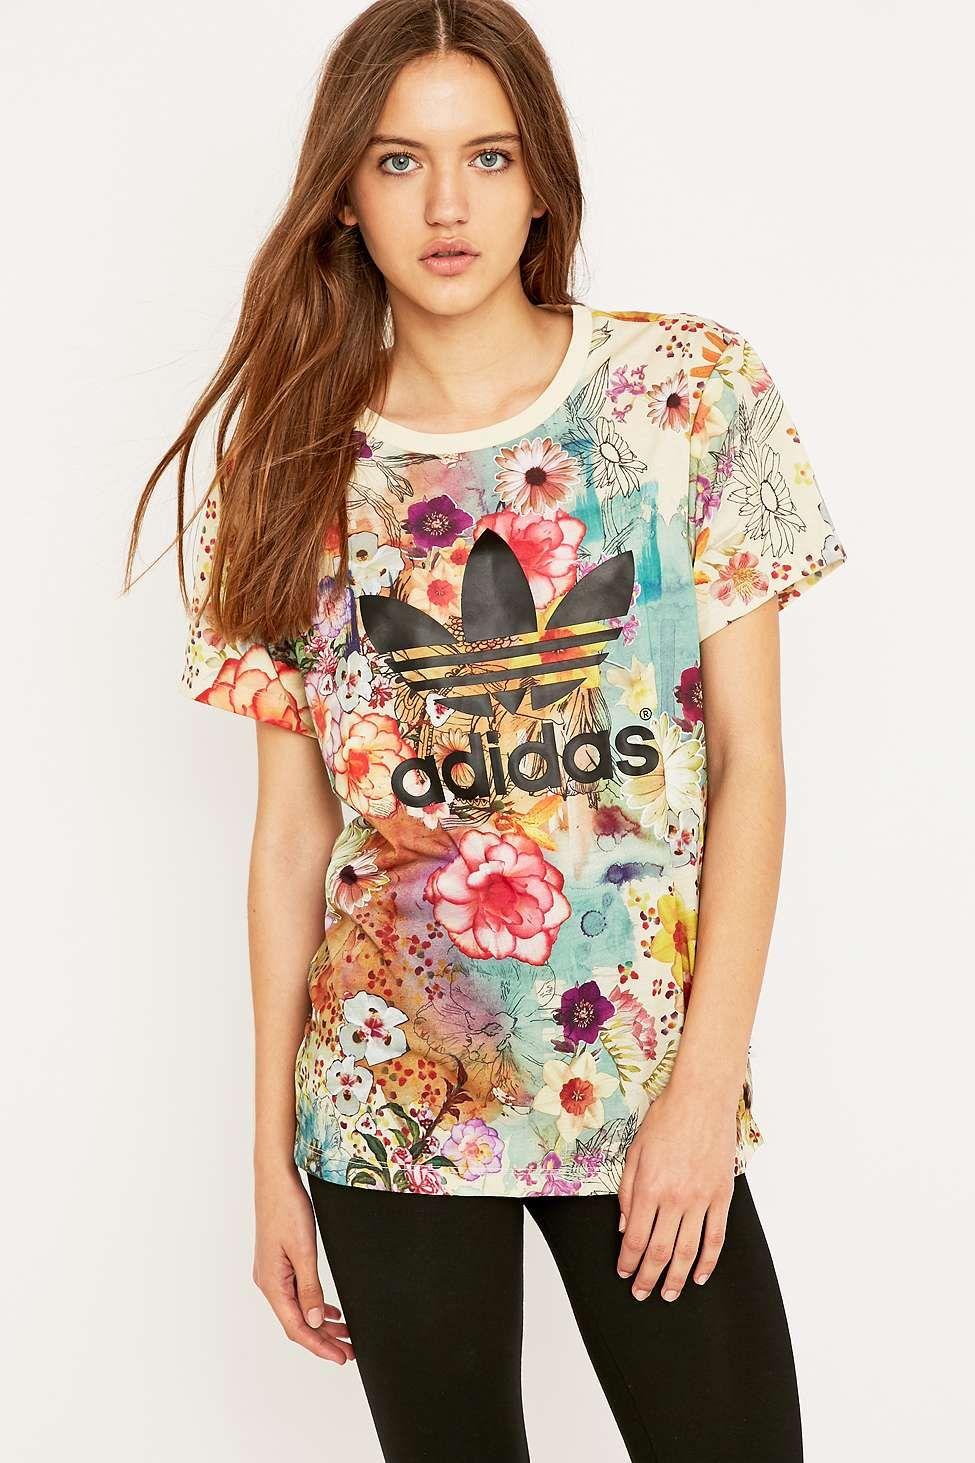 Adidas Originals X Farm Floral Trefoil T Shirt Urban Outfitters Funky Fashion Fashion Adidas Floral [ 1463 x 975 Pixel ]